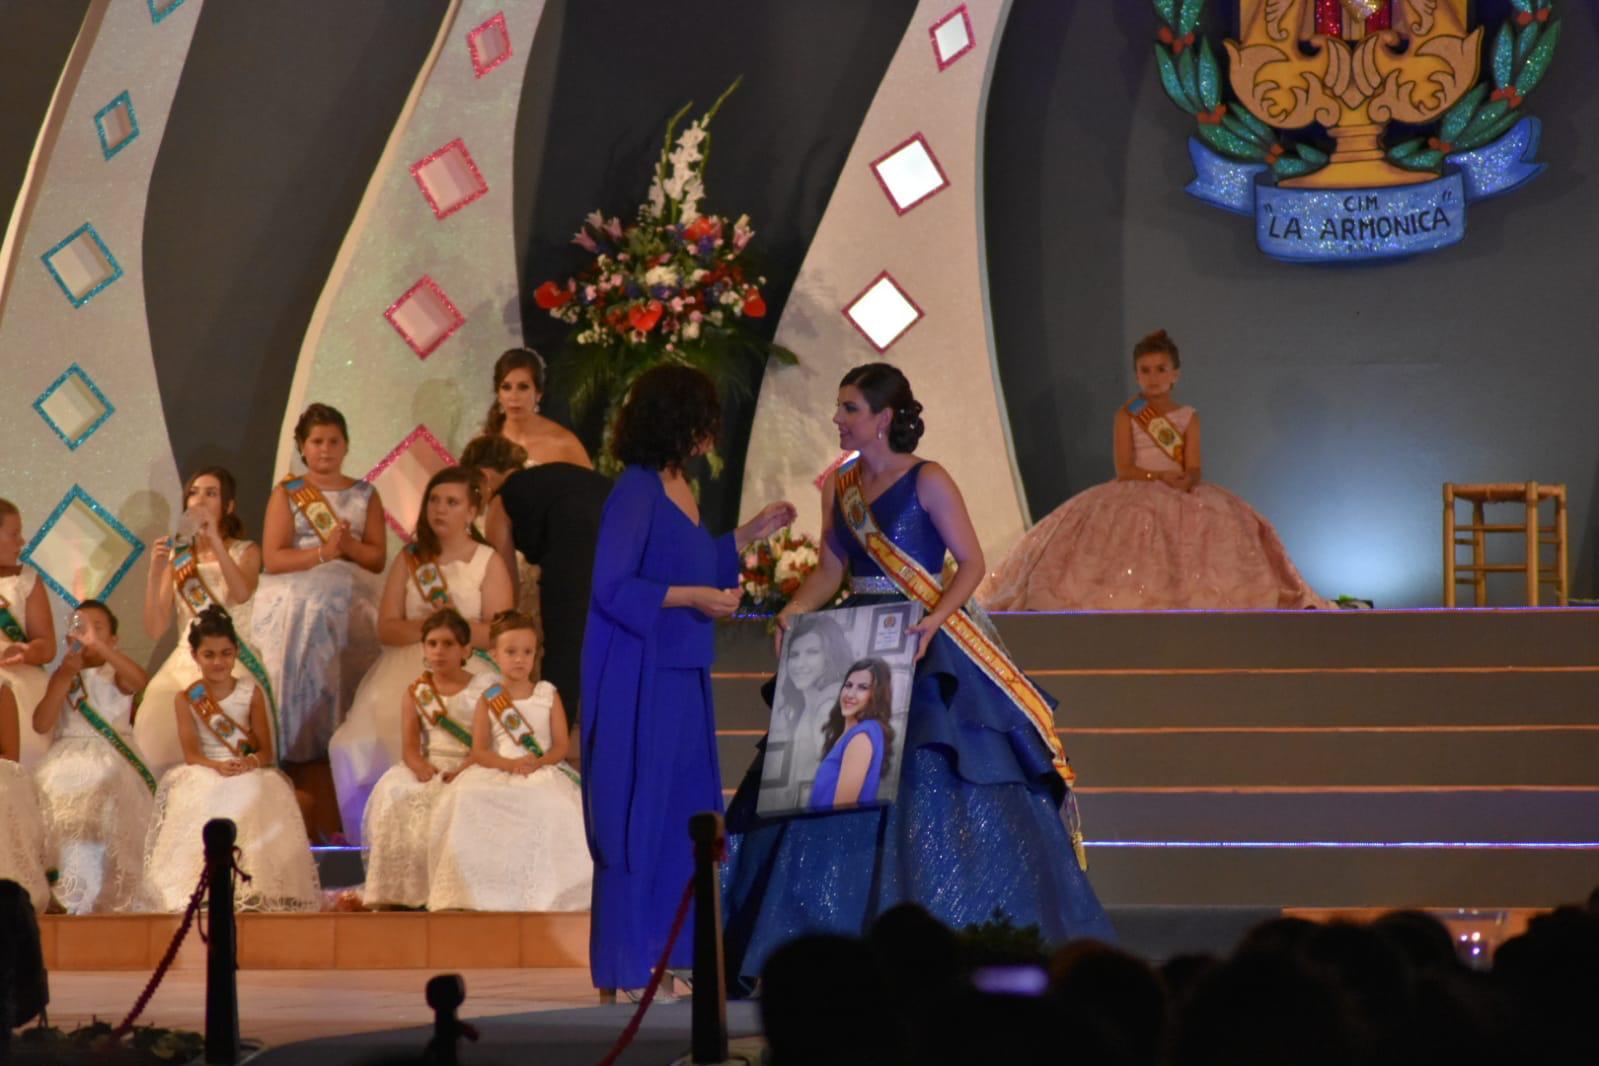 Rosana dejó el título de Miss Armónica en manos de Esther Furriol Ochea.